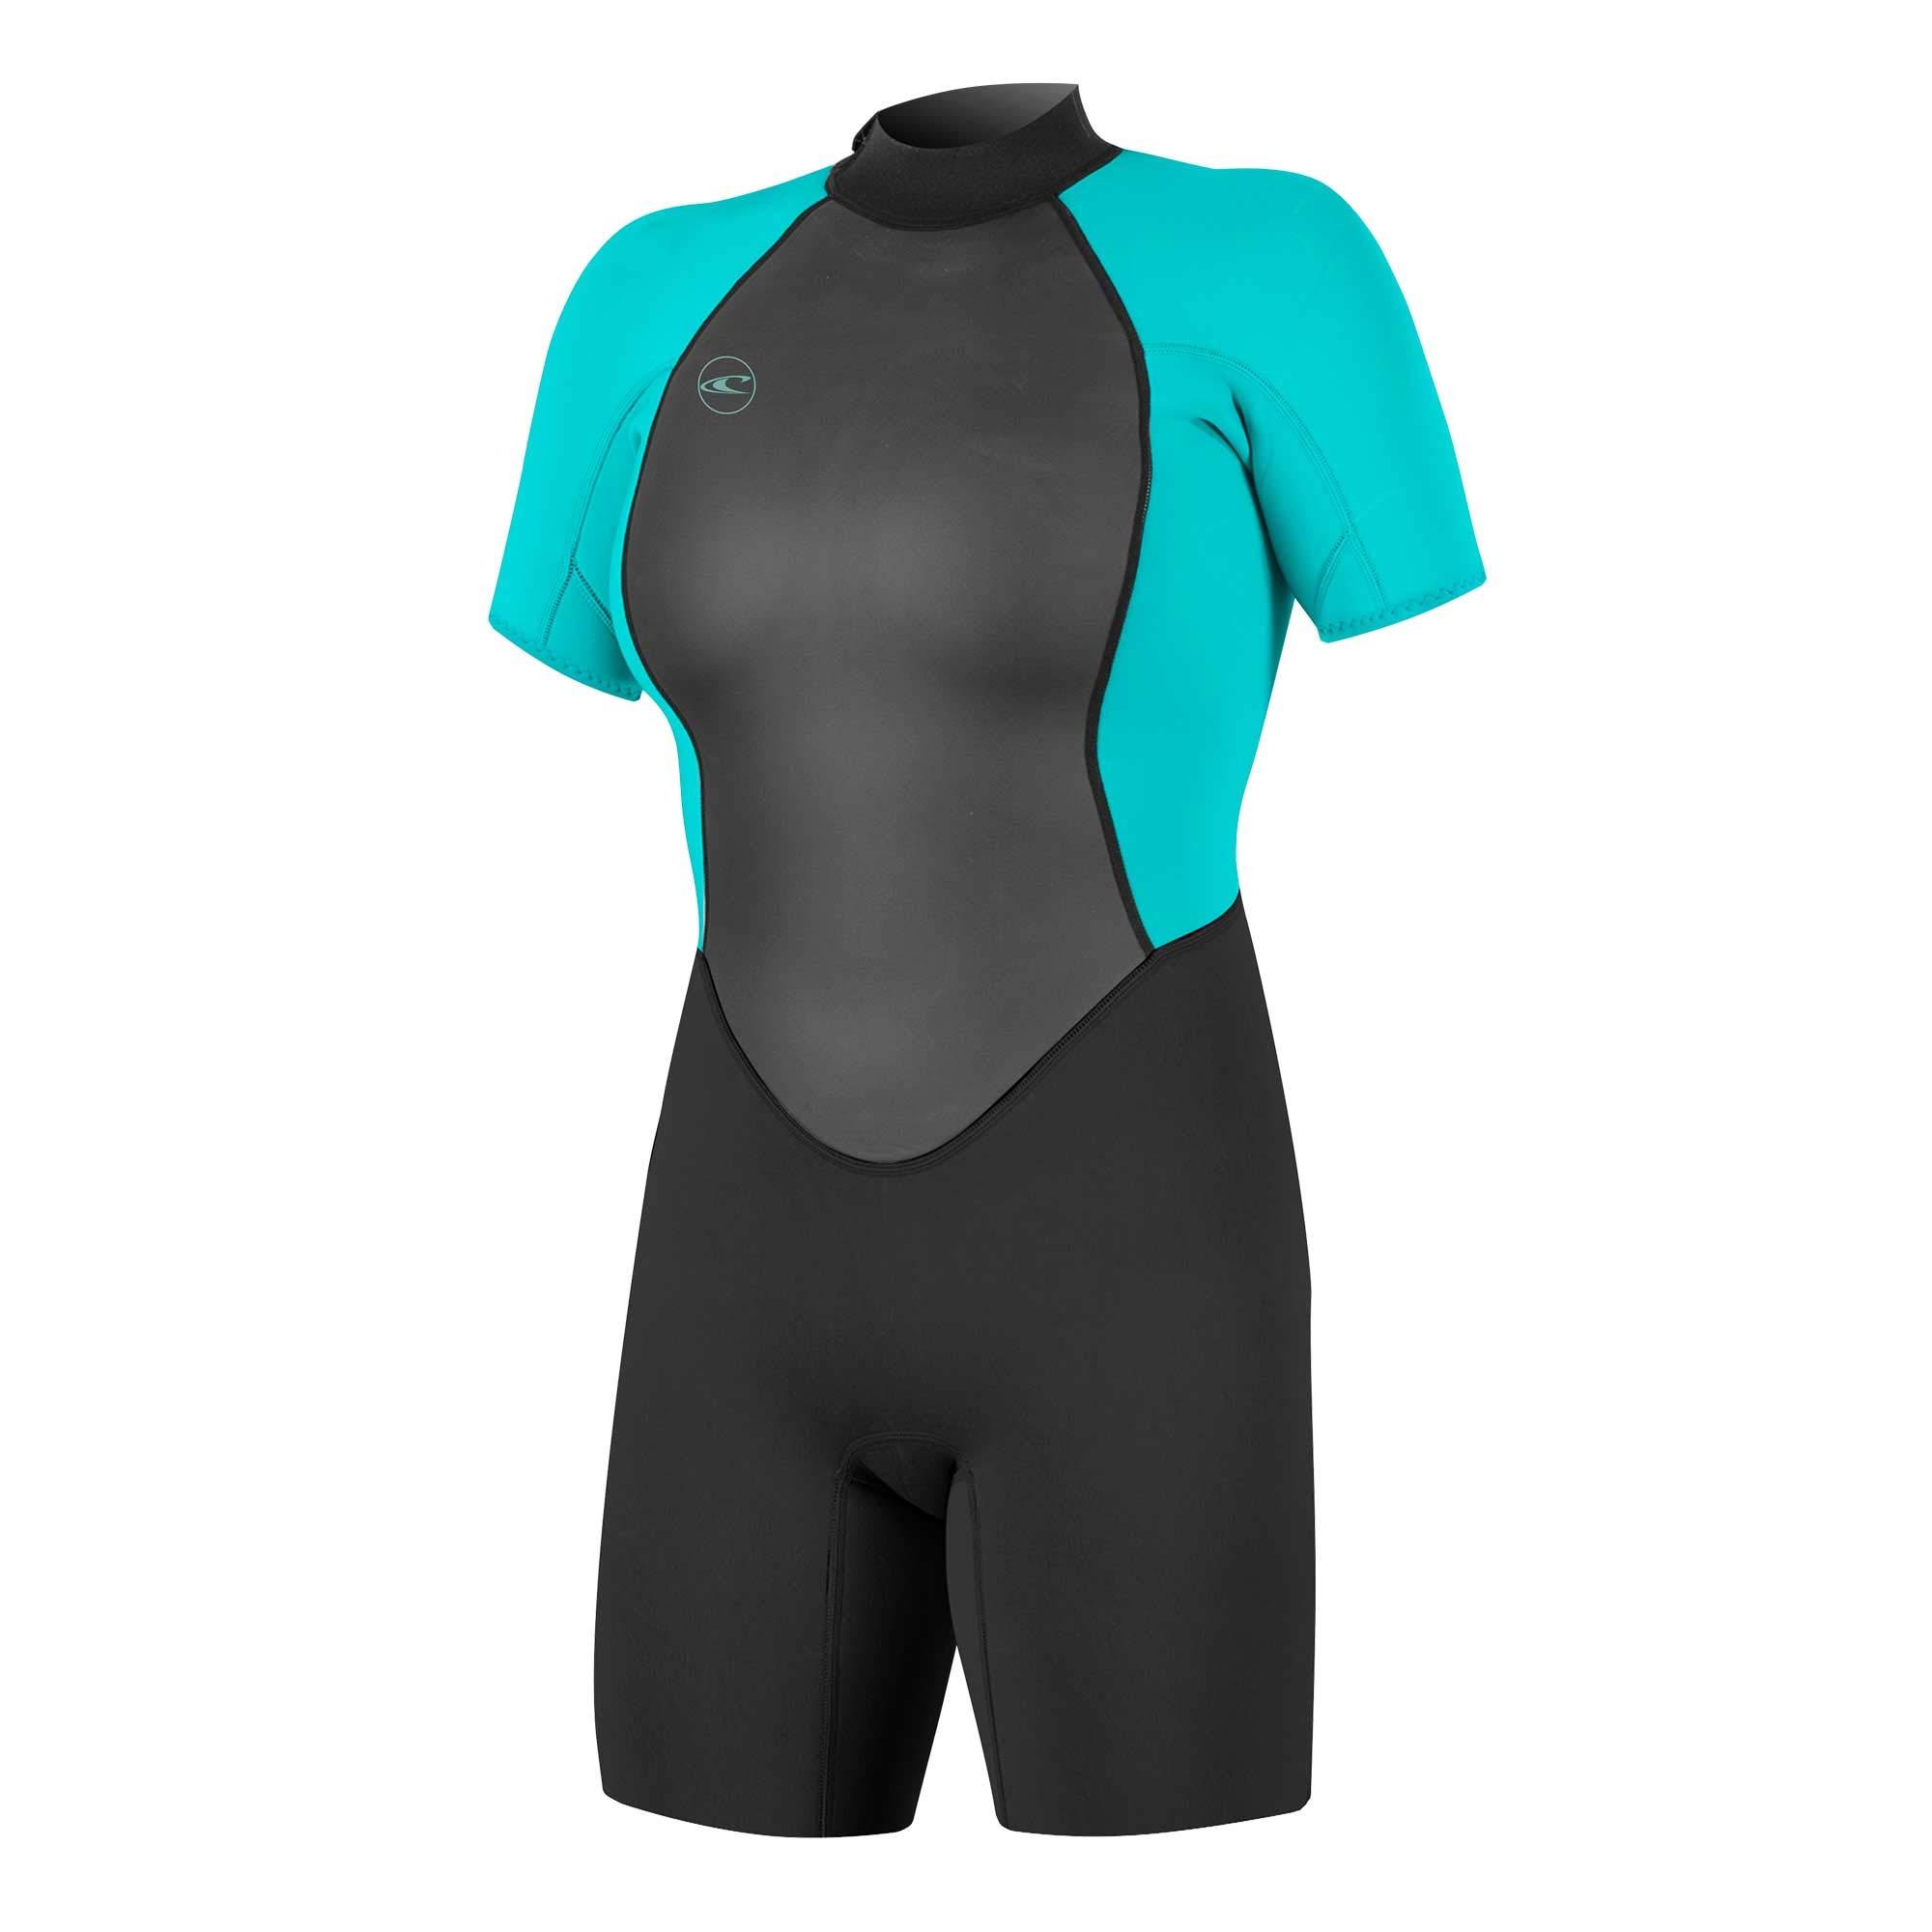 O'Neill Wetsuits Damen Reactor II 2mm Back Zip Spring Wetsuit Neoprenanzug, Blac